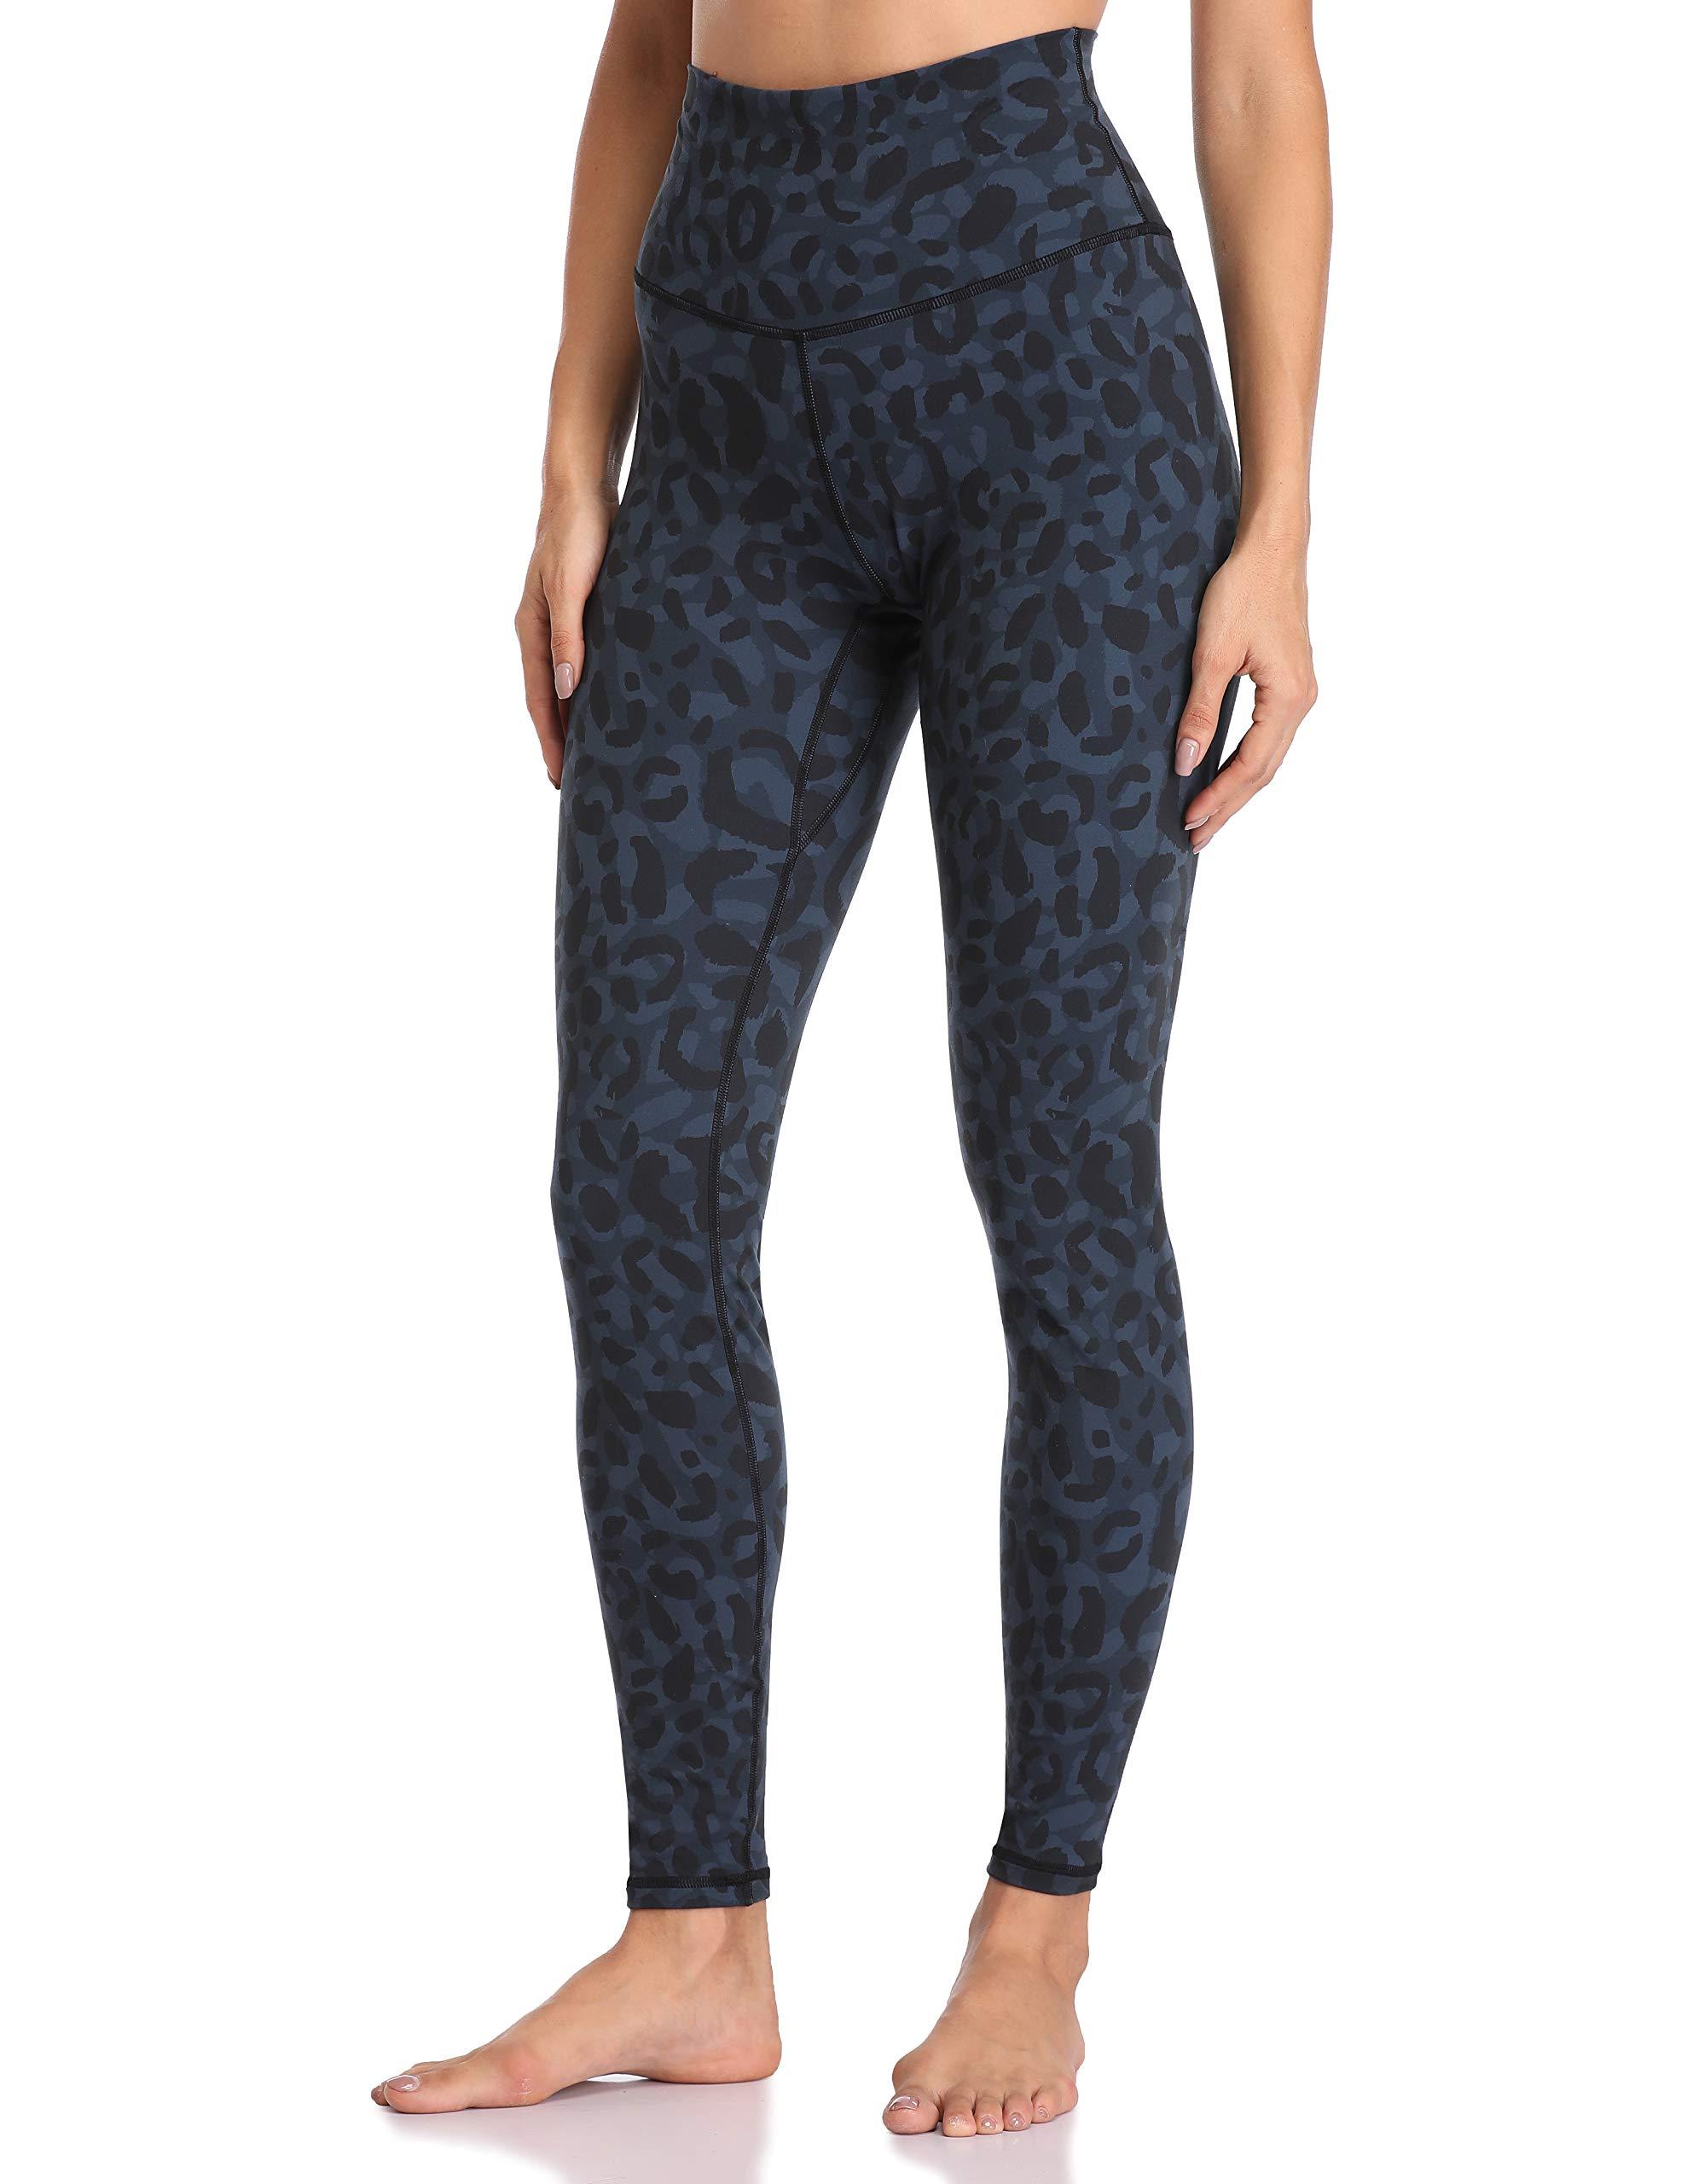 Colorfulkoala Women's High Waisted Pattern Leggings Full-Length Yoga Pants (S, Cyan Leopard) by Colorfulkoala